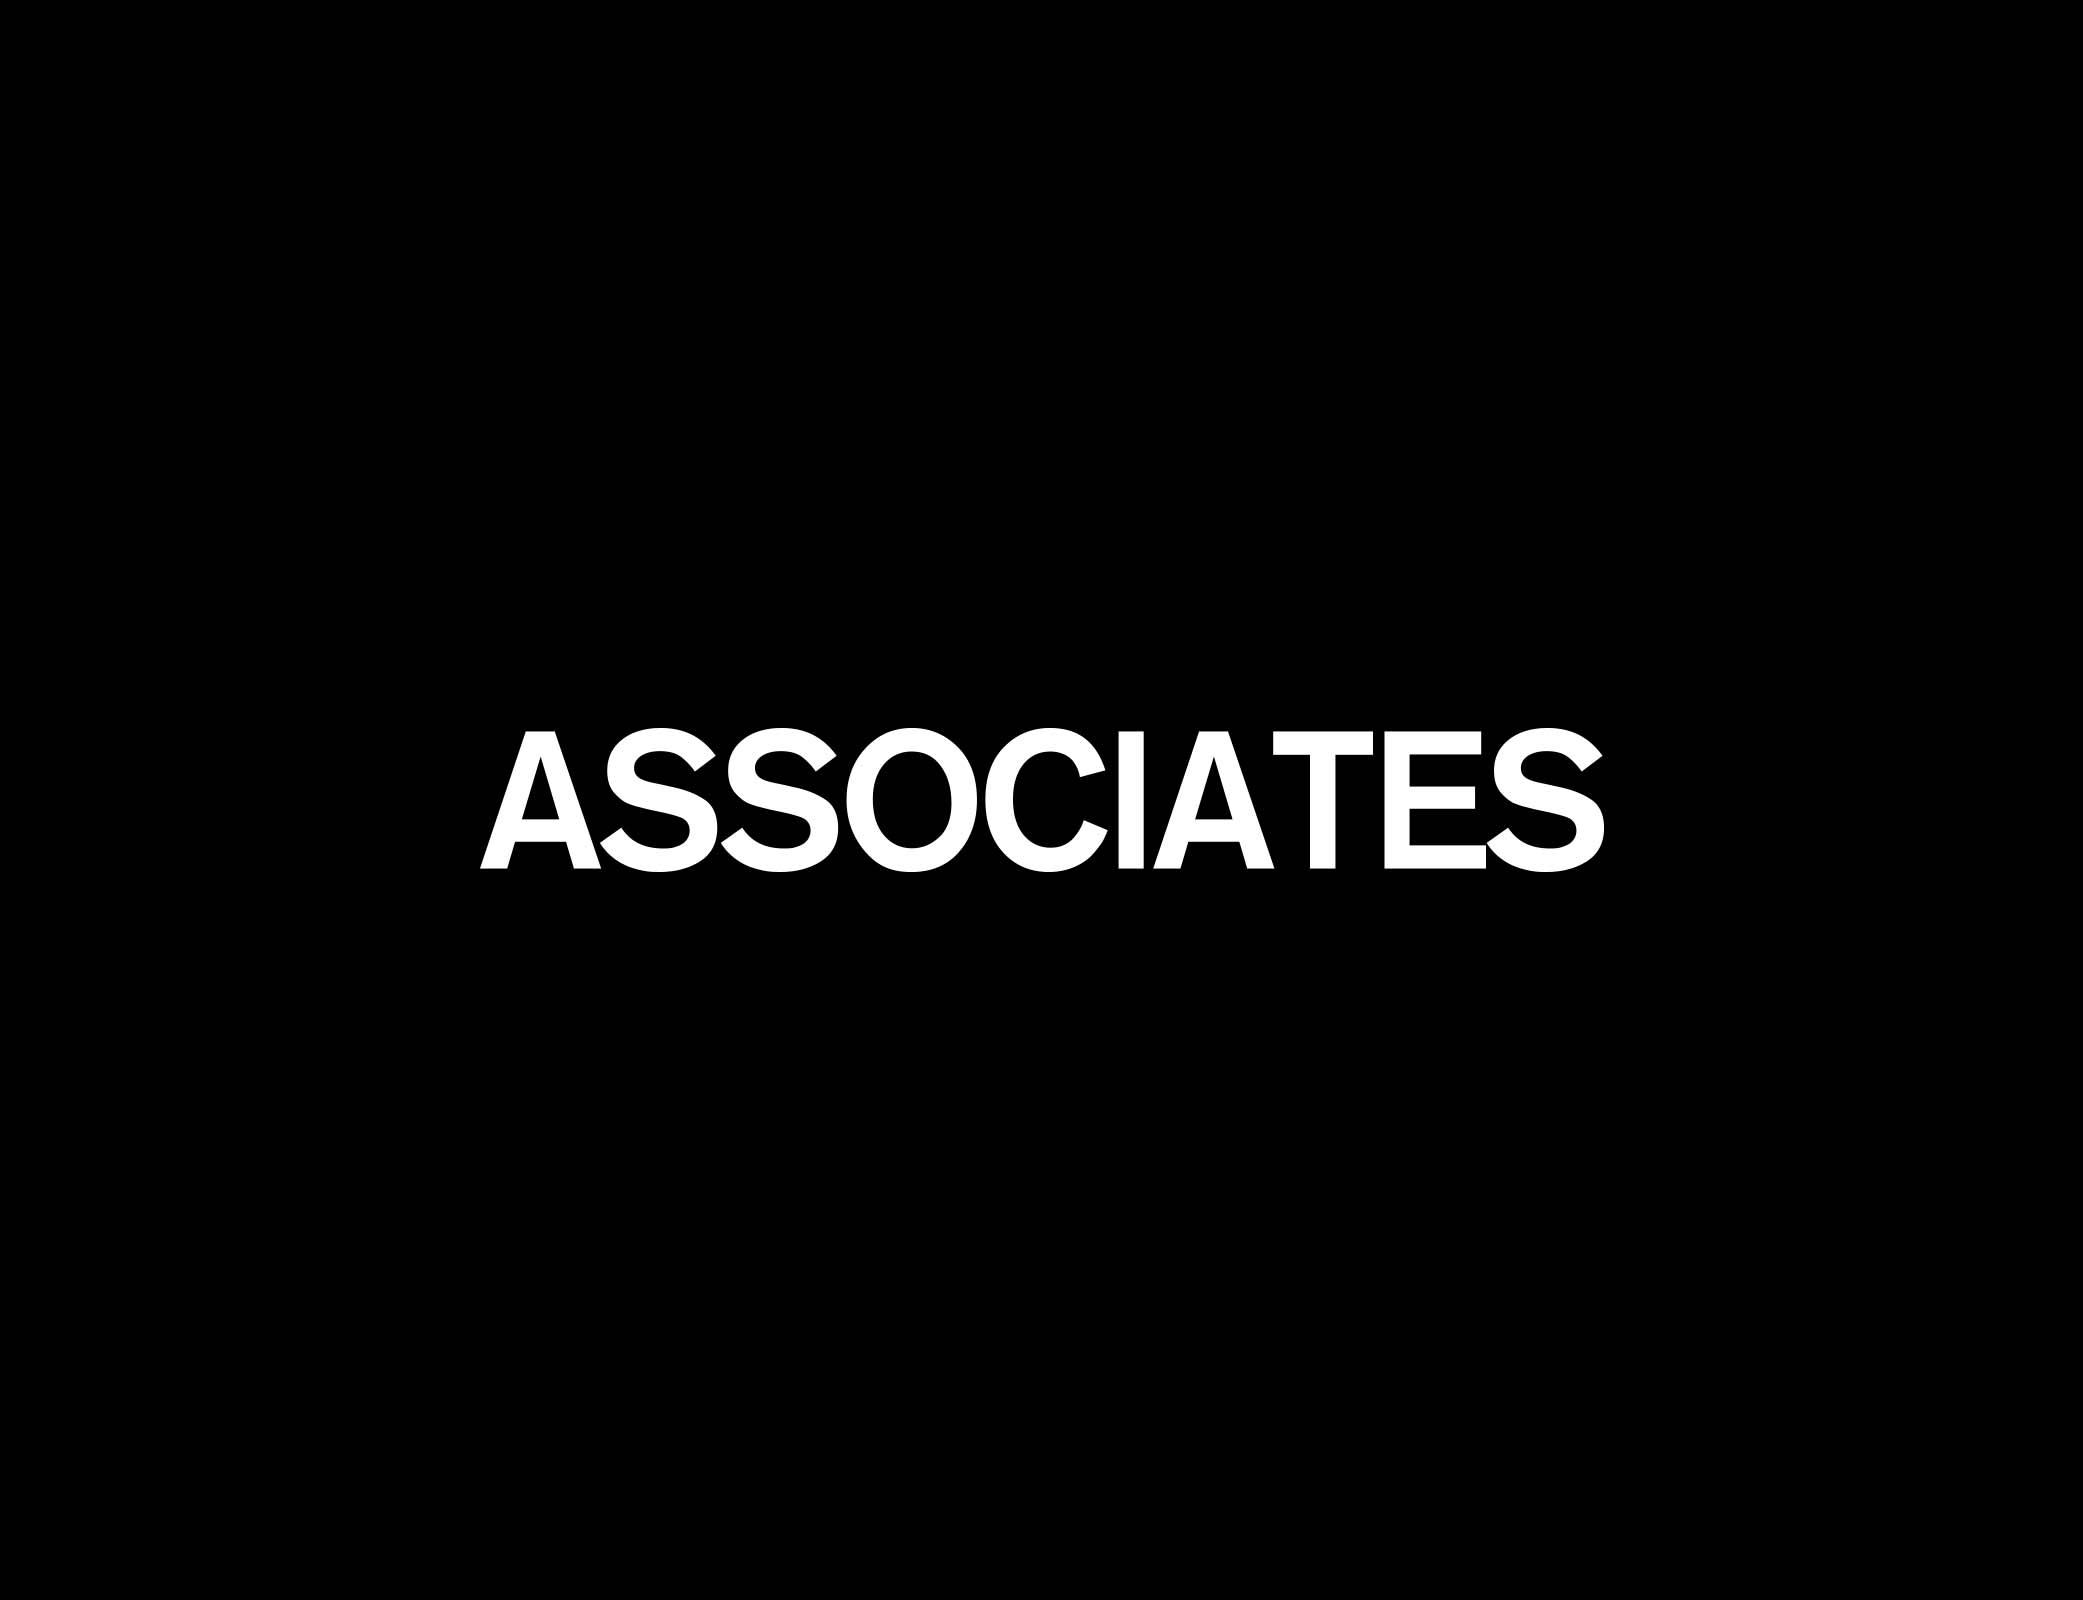 home_associates_balckbox